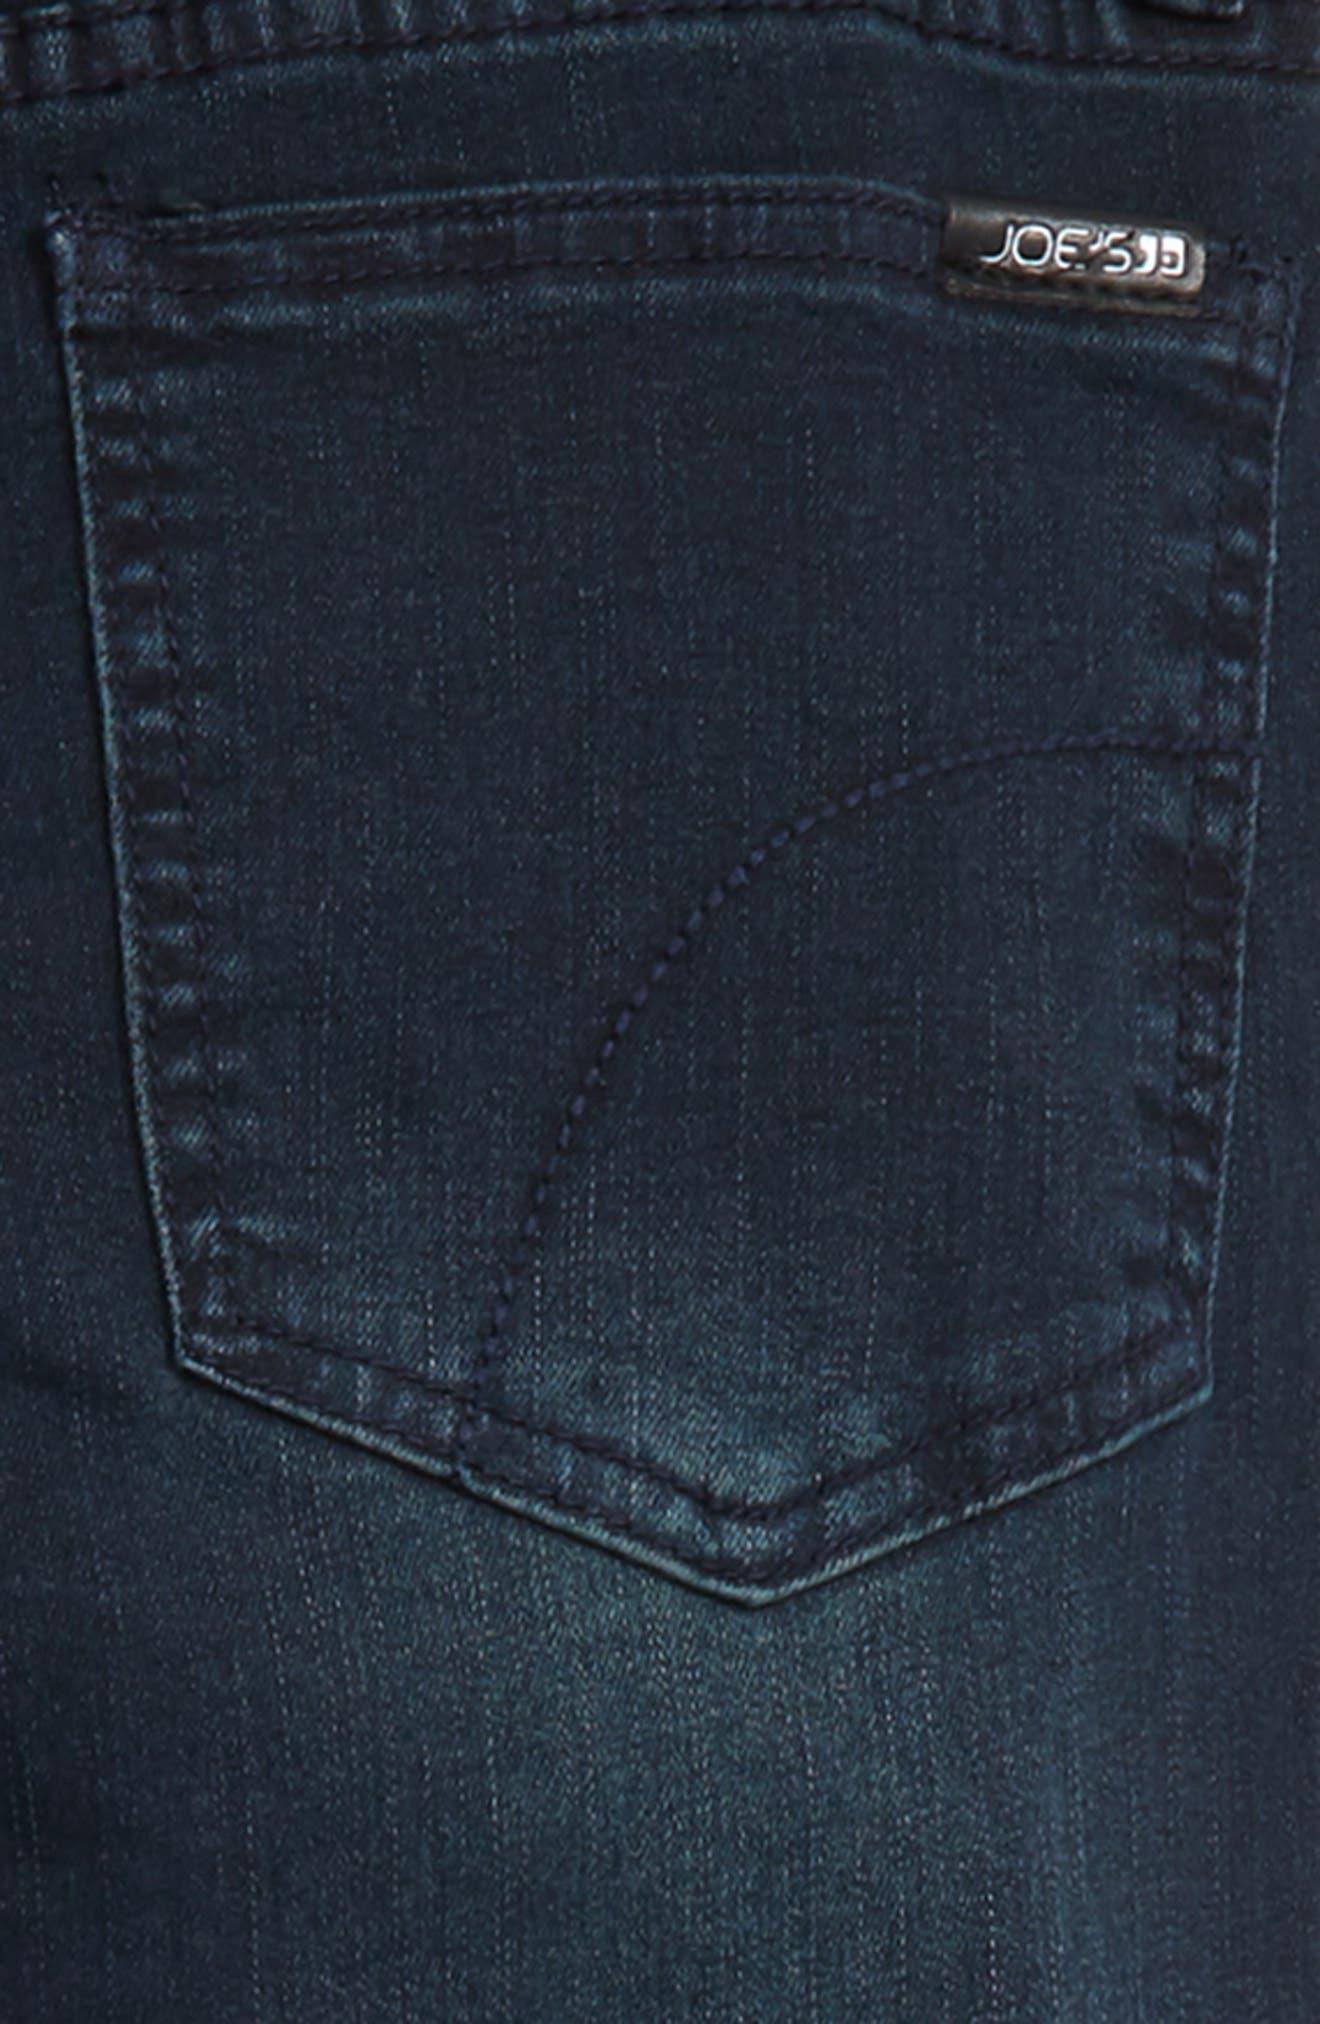 Rad Kinetic Stretch Skinny Jeans,                             Alternate thumbnail 3, color,                             020